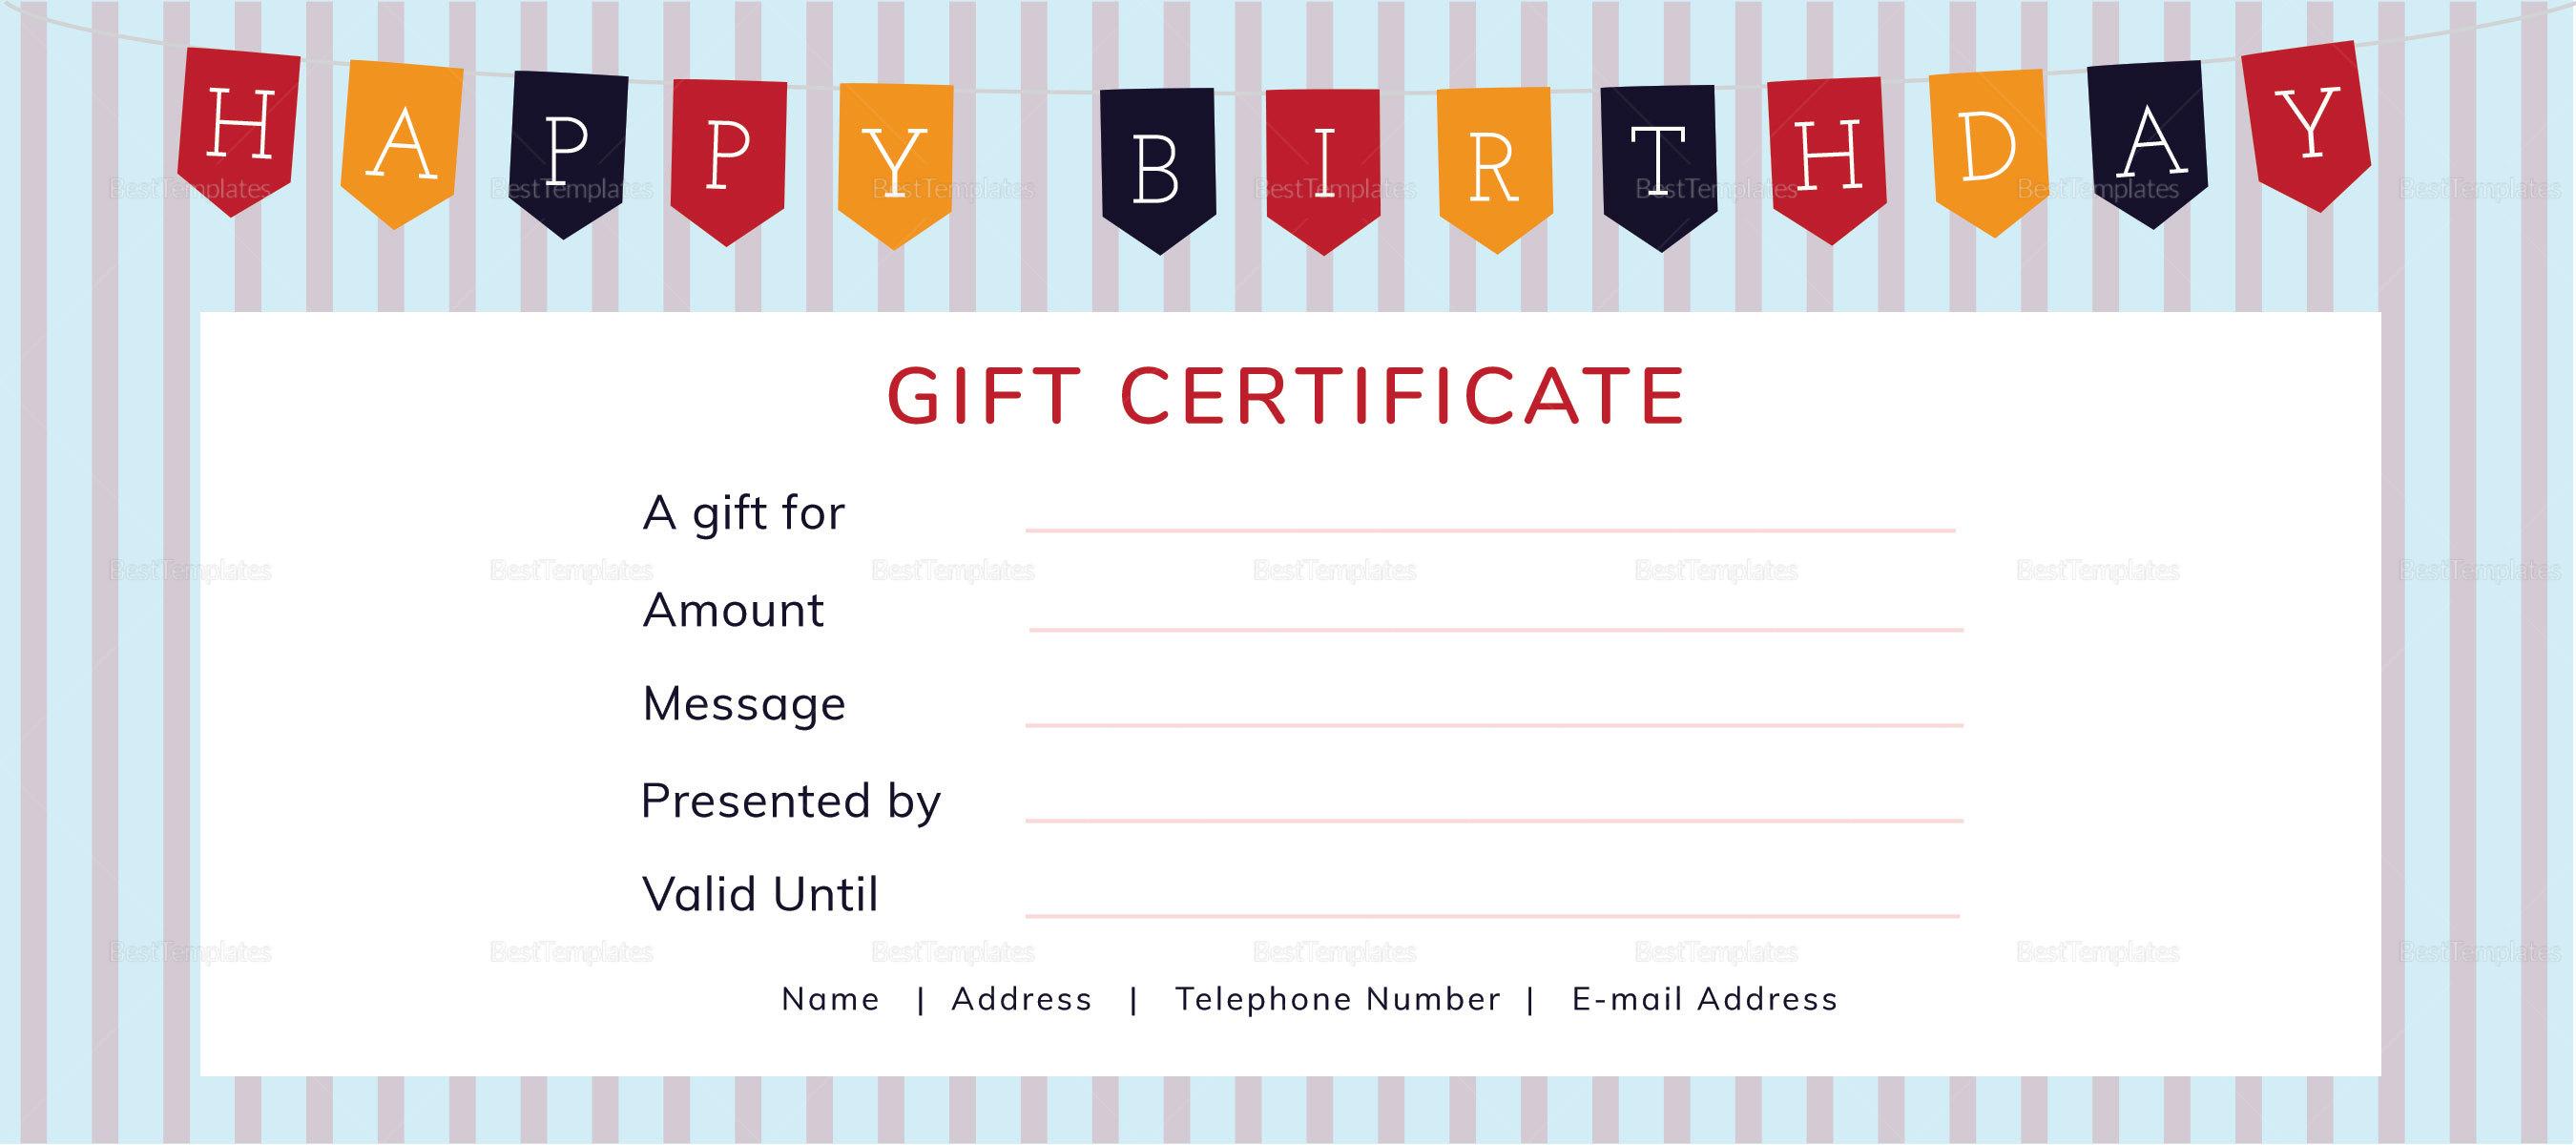 Birthday Gift Certificate Template Ivoiregion